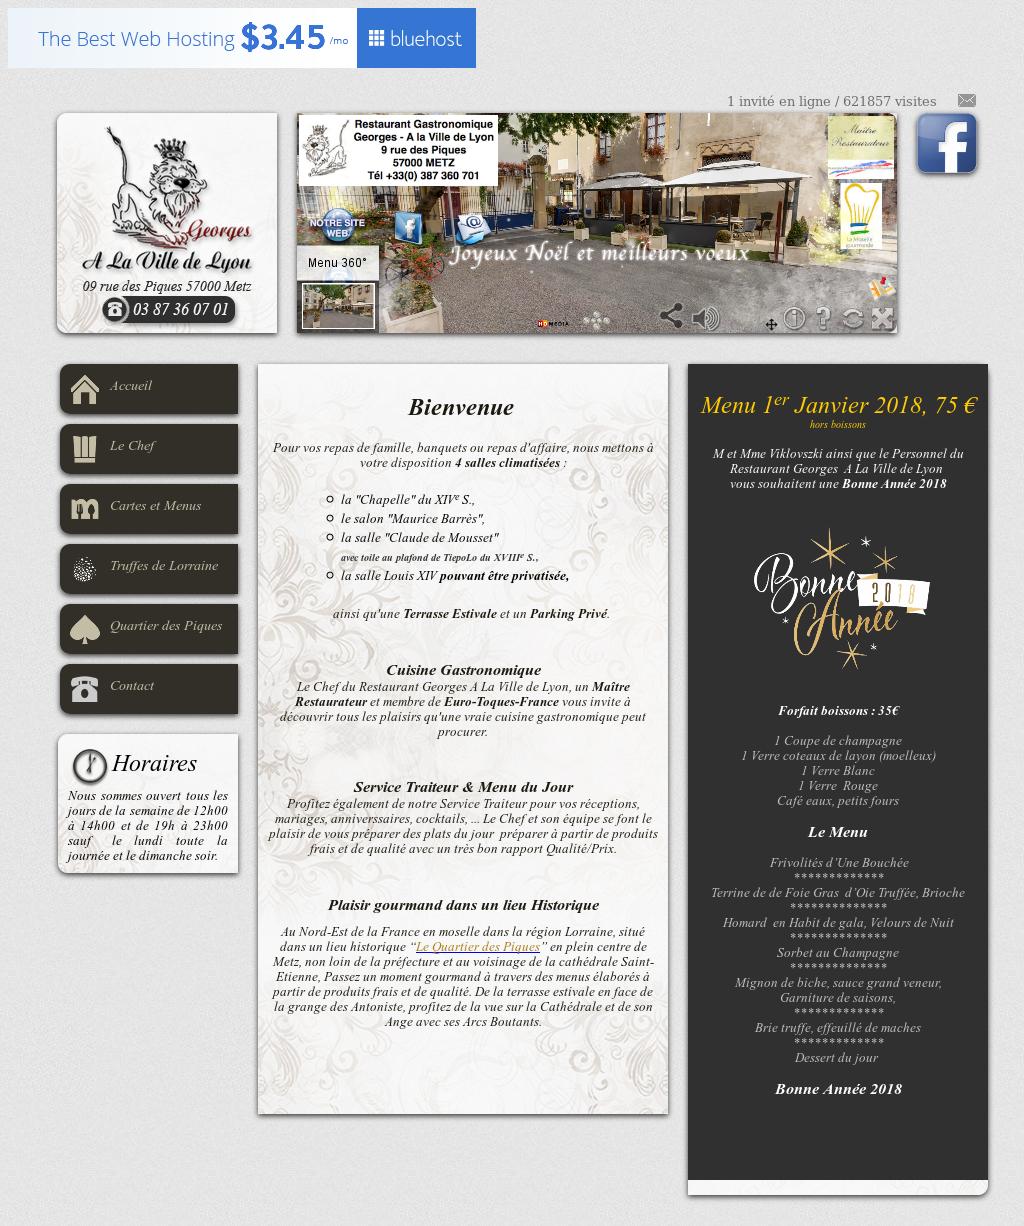 Restaurant Georges A La Ville De Lyons Website Screenshot On Jan 2018